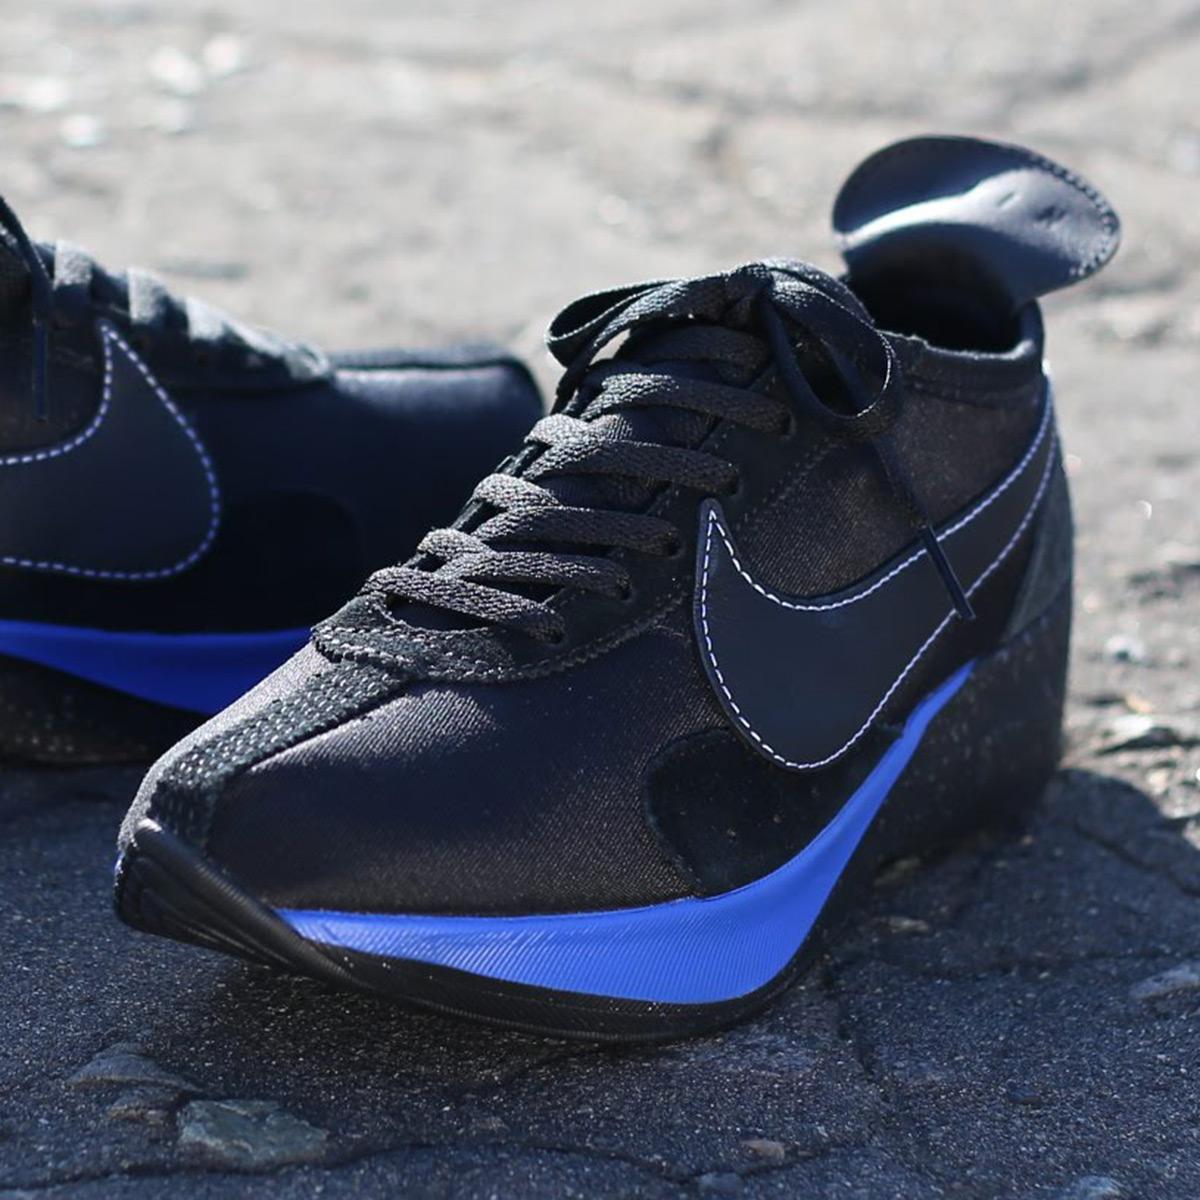 0c2aa112133e NIKE MOON RACER QS (Nike moon racer QS) (BLACK BLACK-WHITE-RACER BLUE)  18HO-I